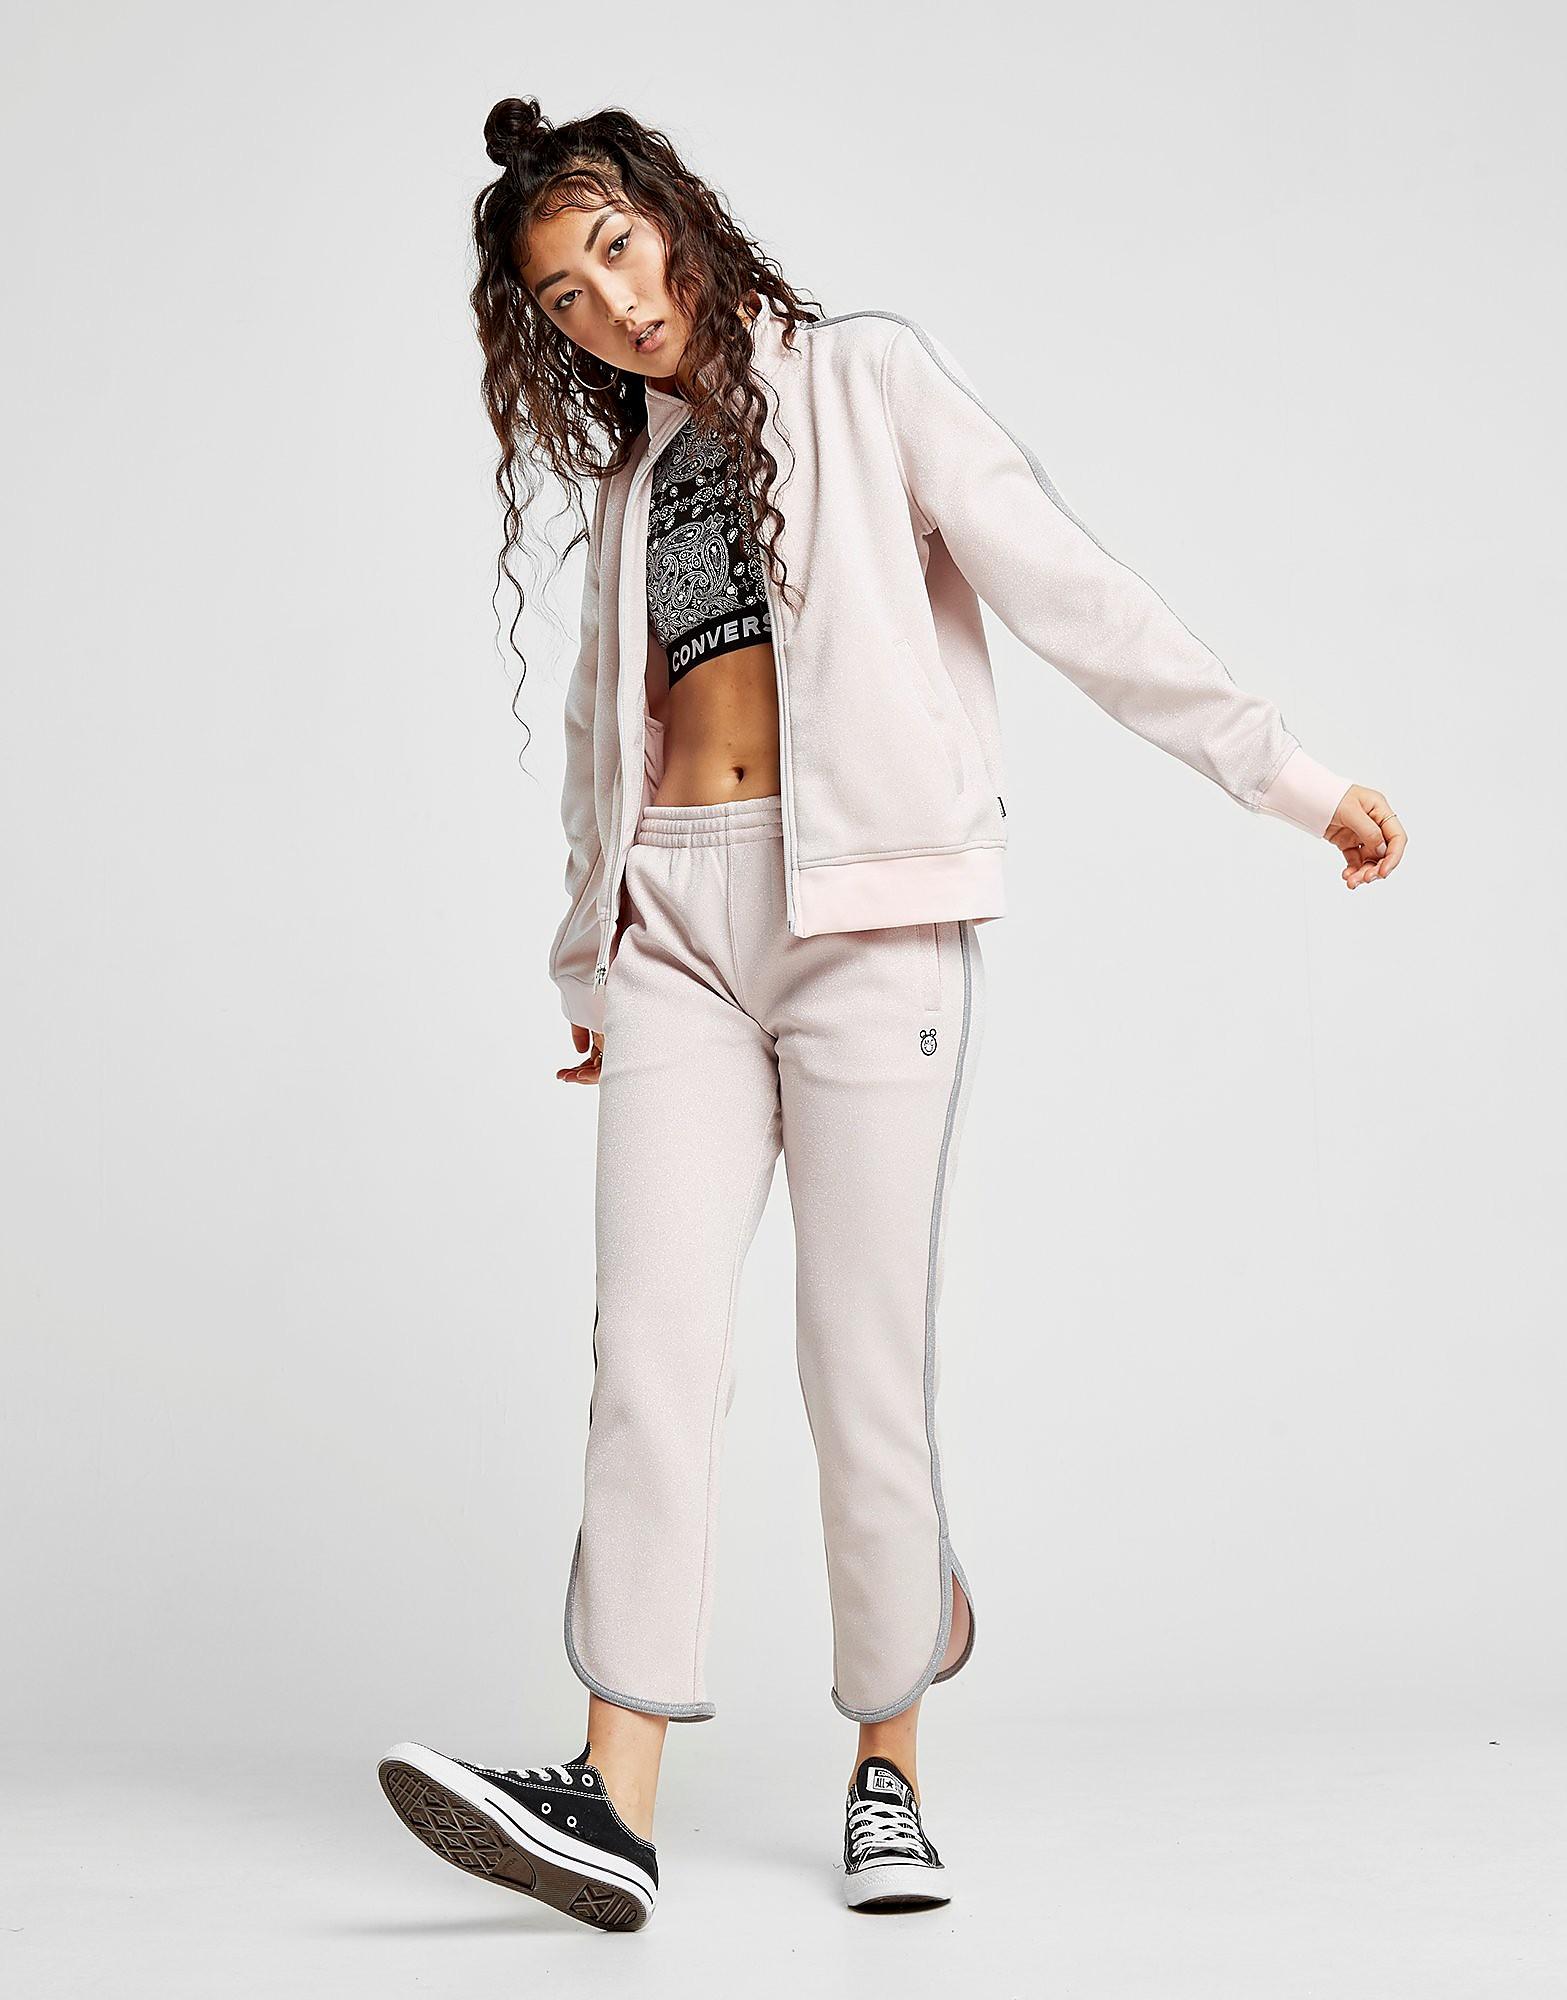 Converse x Miley Cyrus Sparkle Track Top